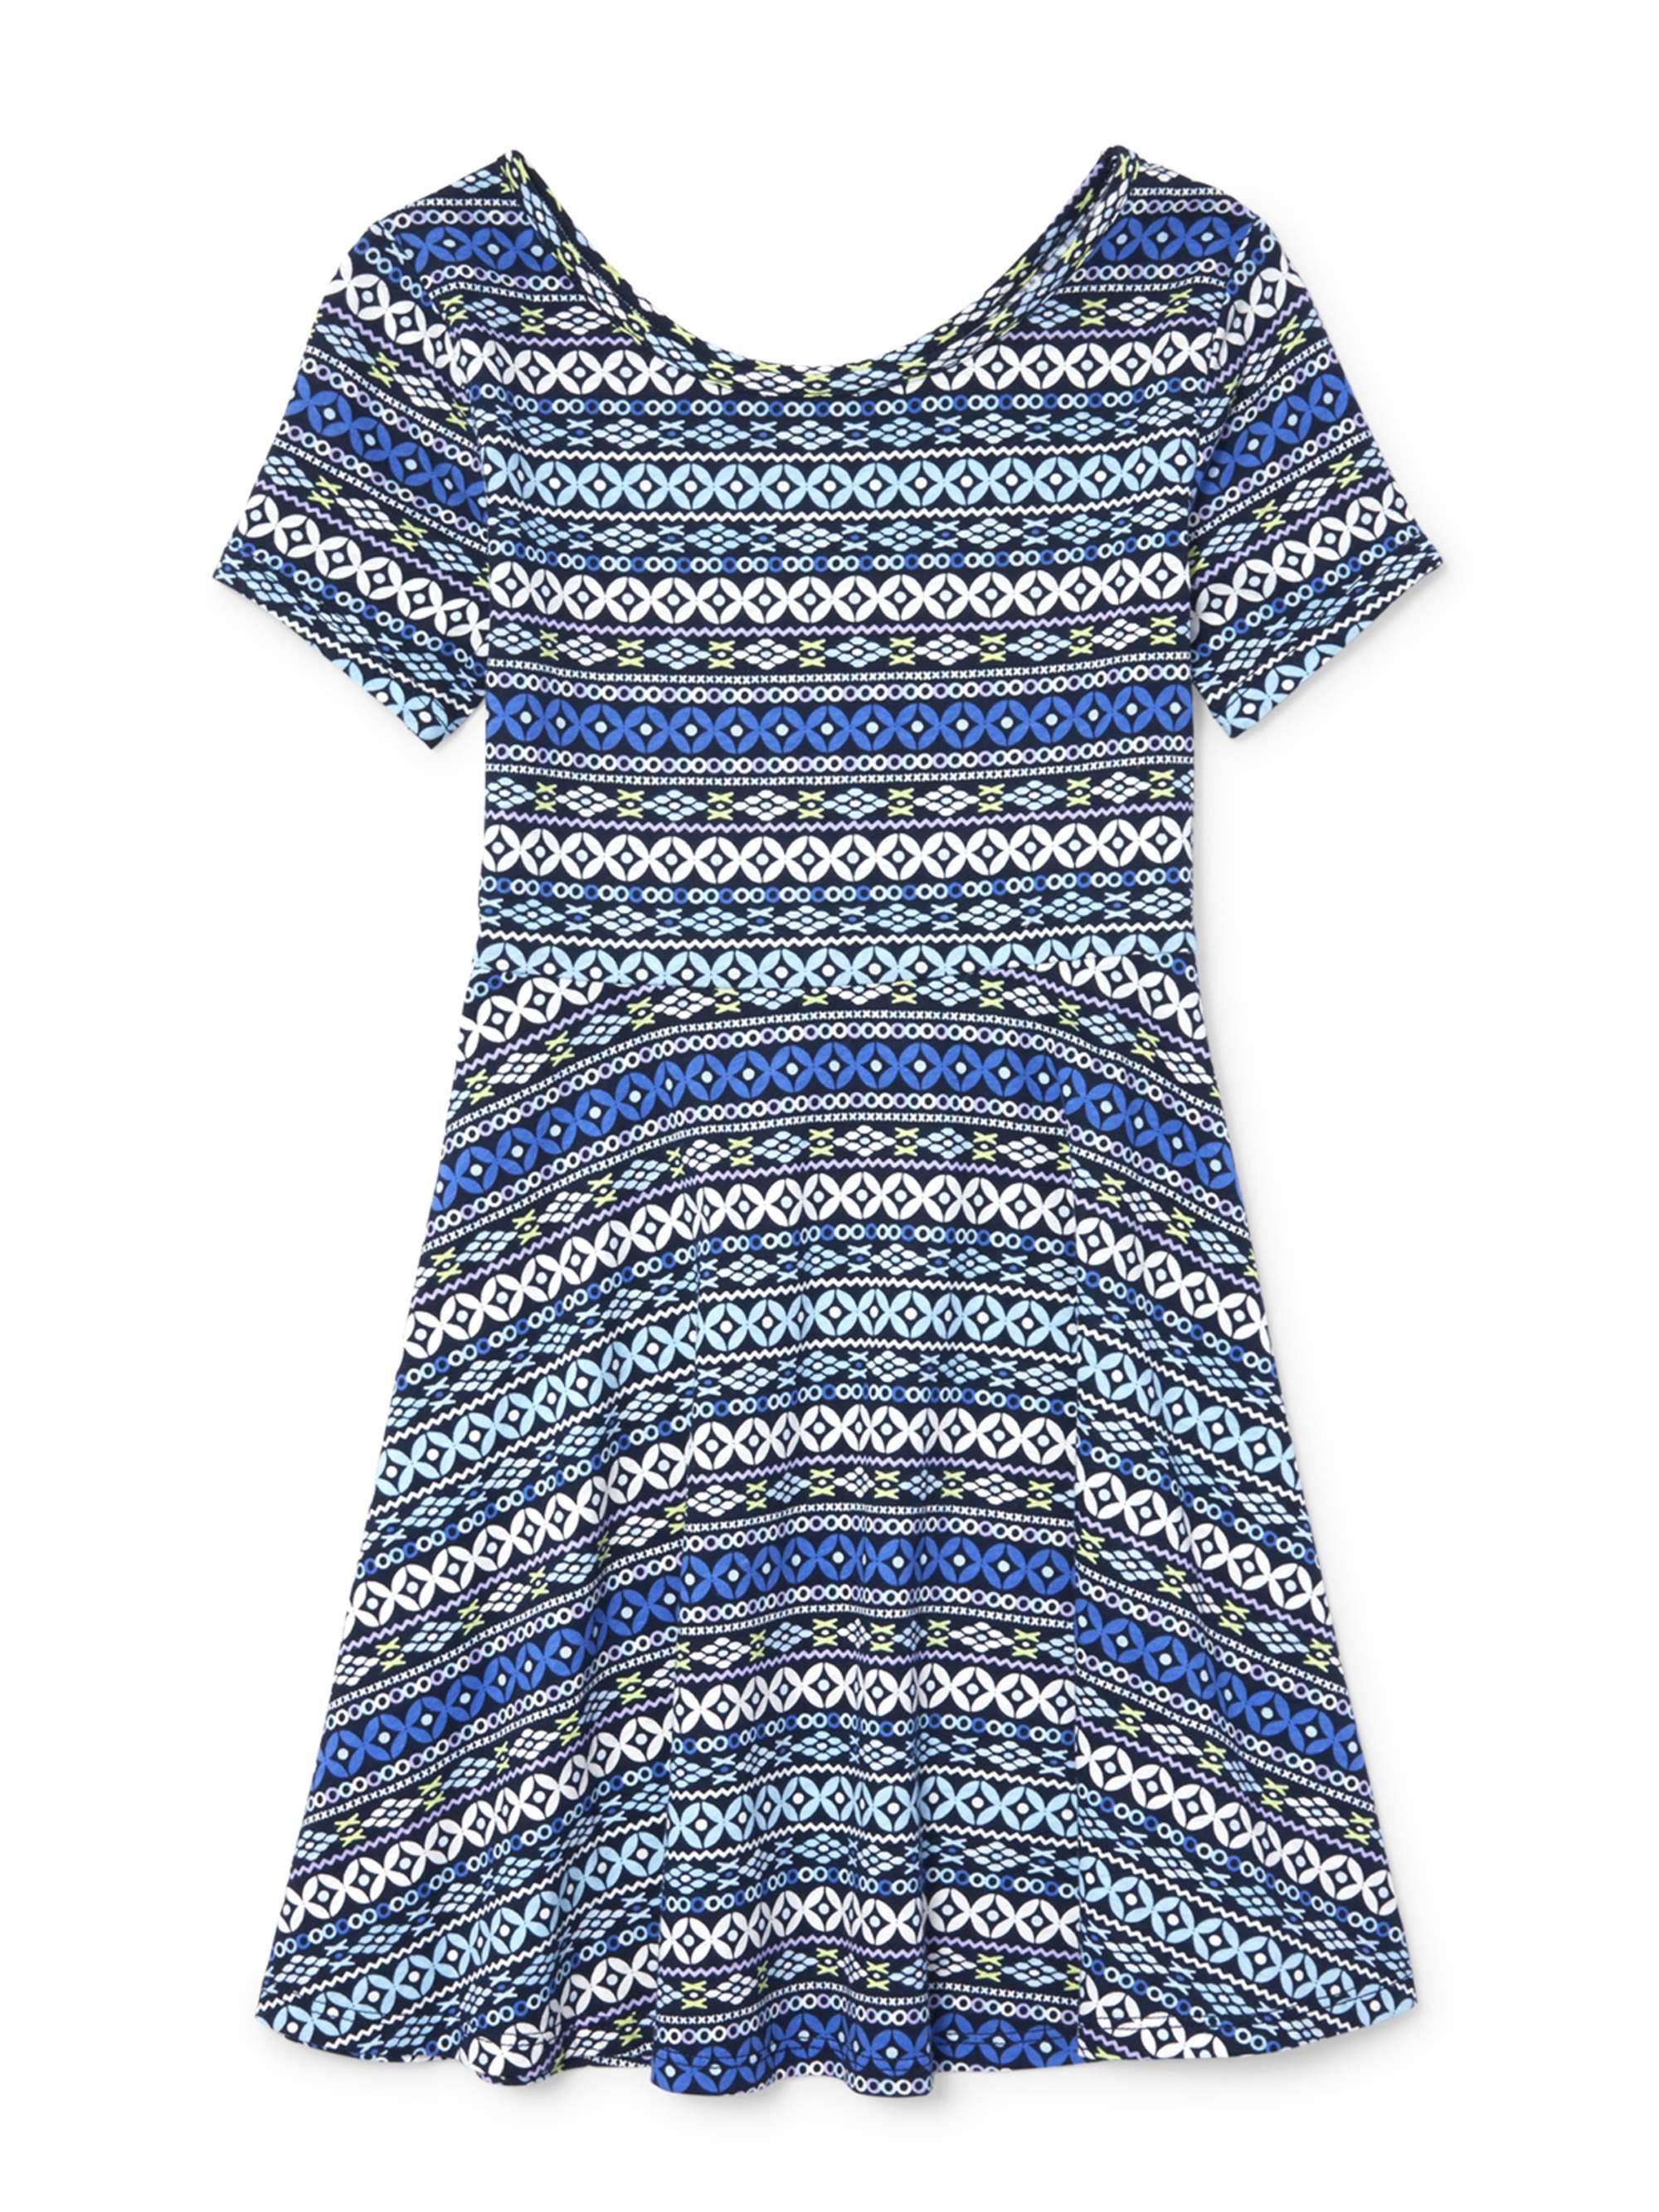 Short Sleeve Fit and Flare Jersey Dress (Little Girls & Big Girls)